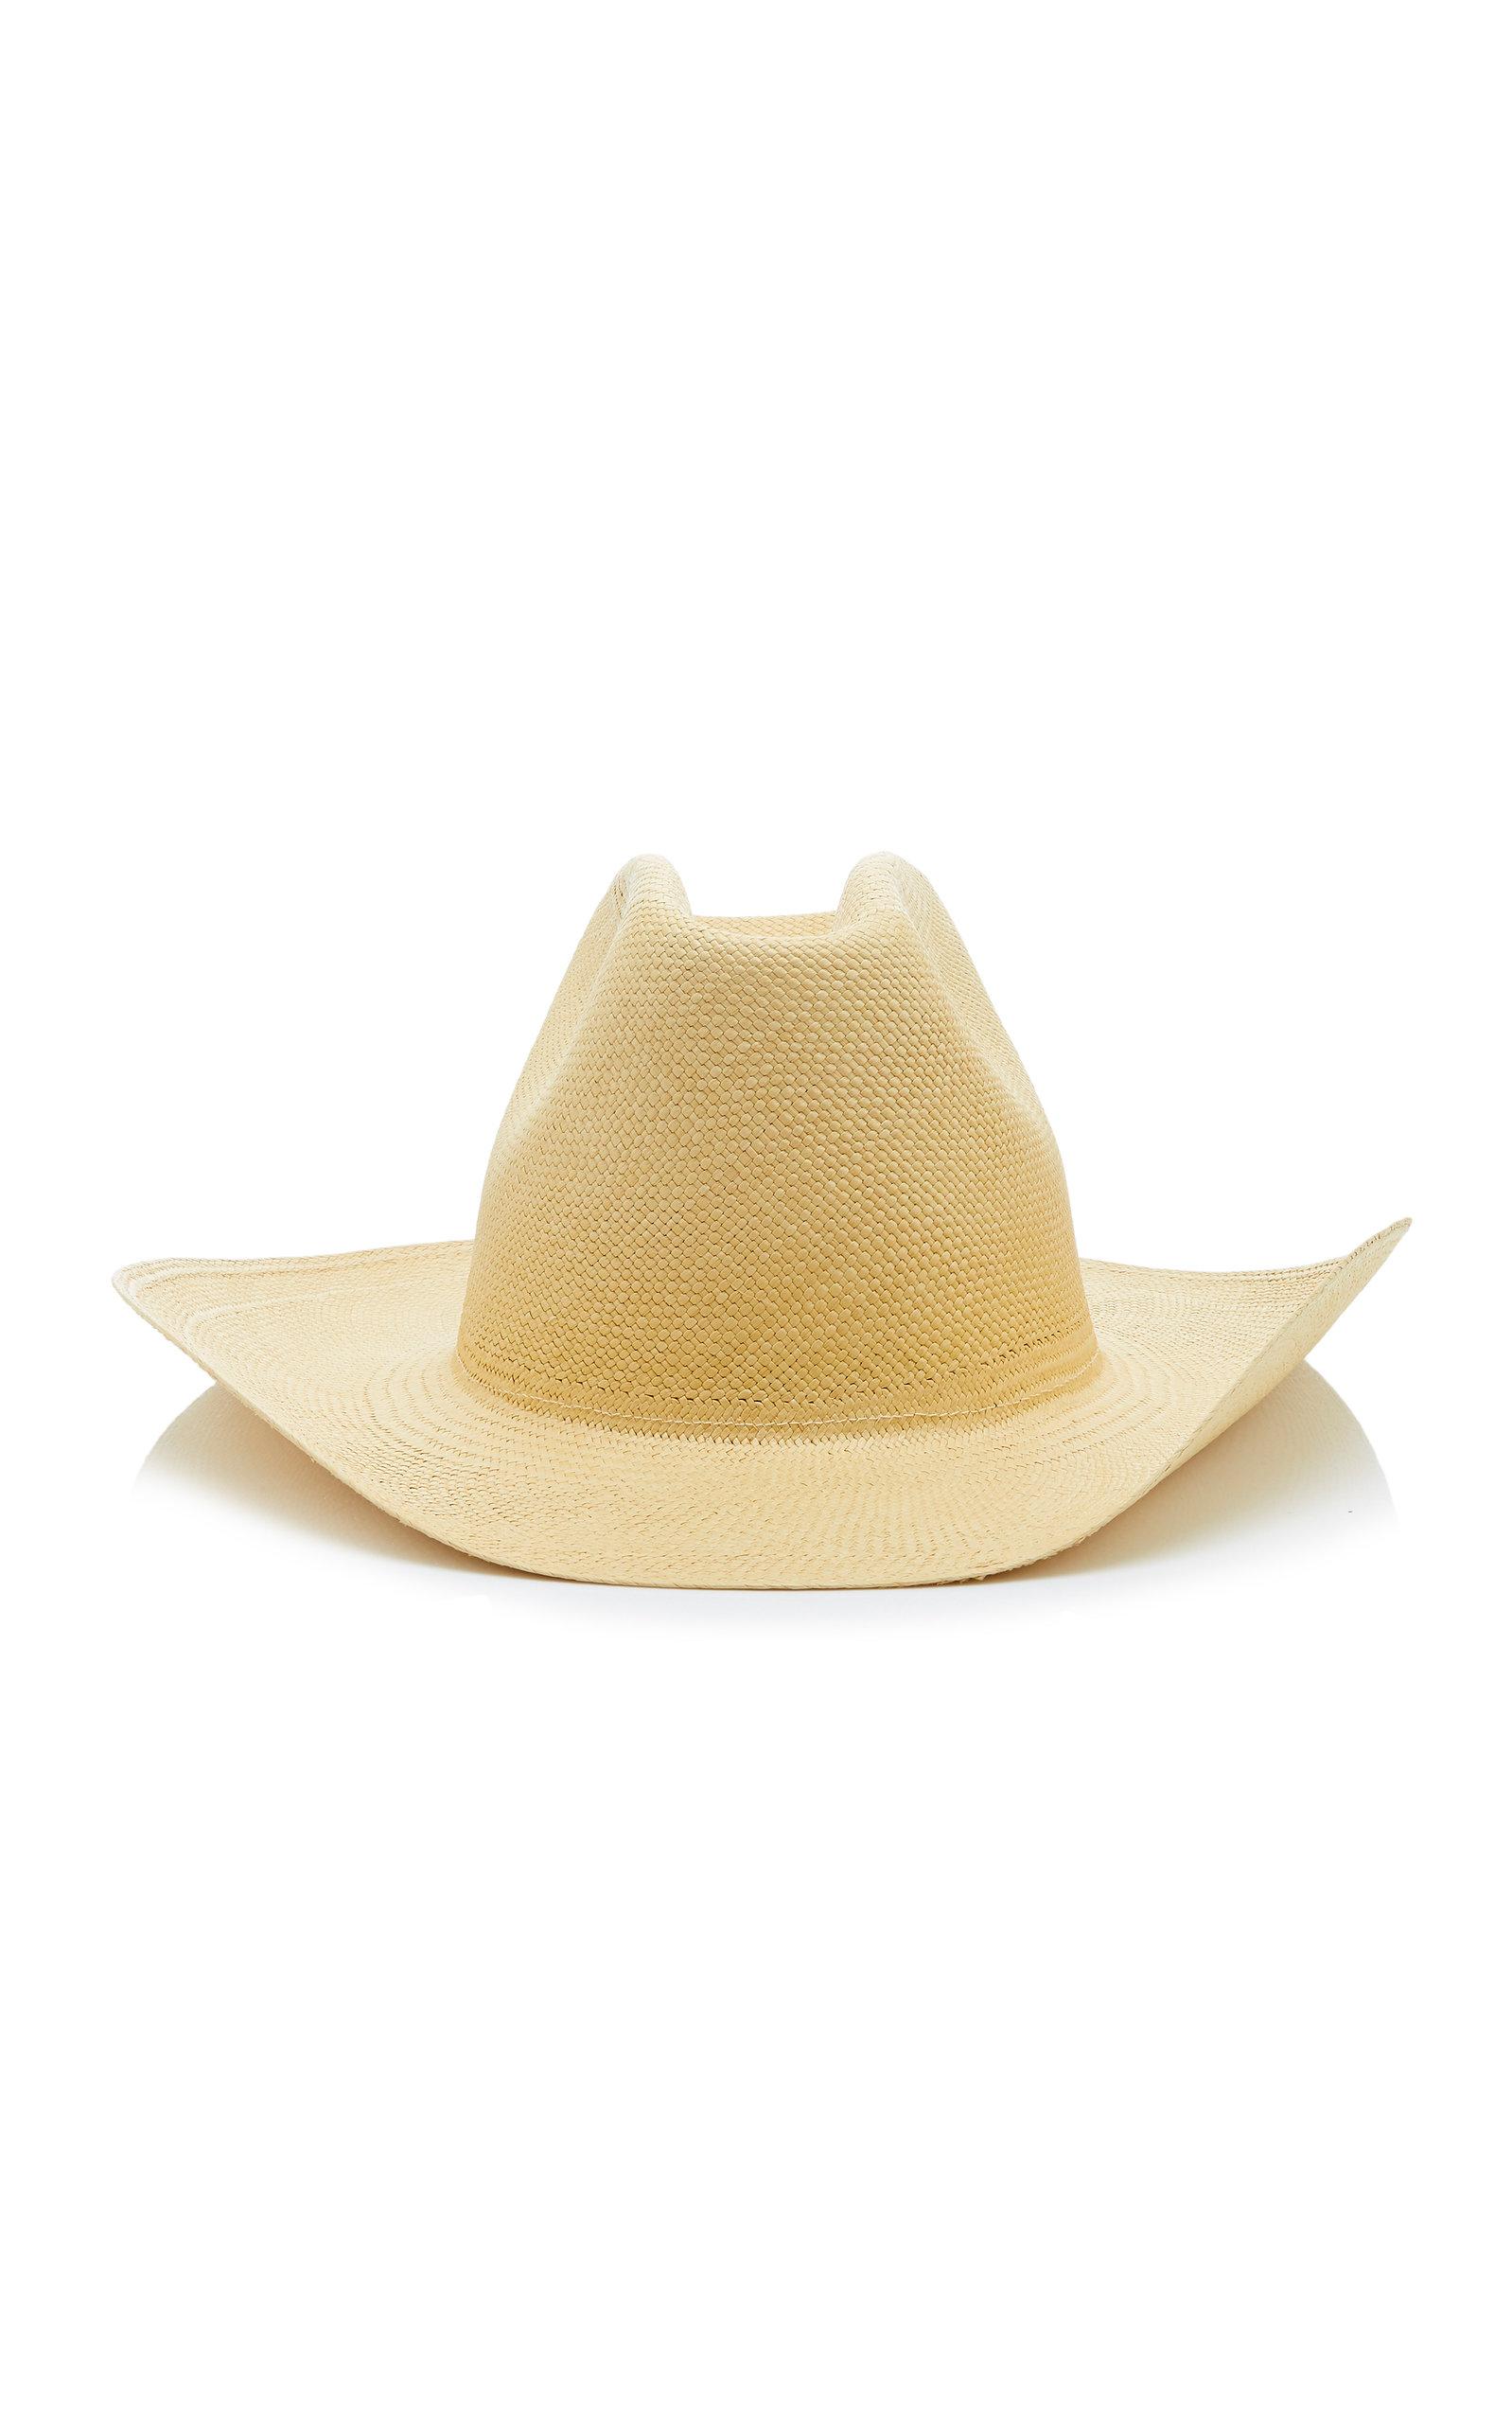 311f6cd4ef5aa ClydeStraw Cowboy Hat. CLOSE. Loading